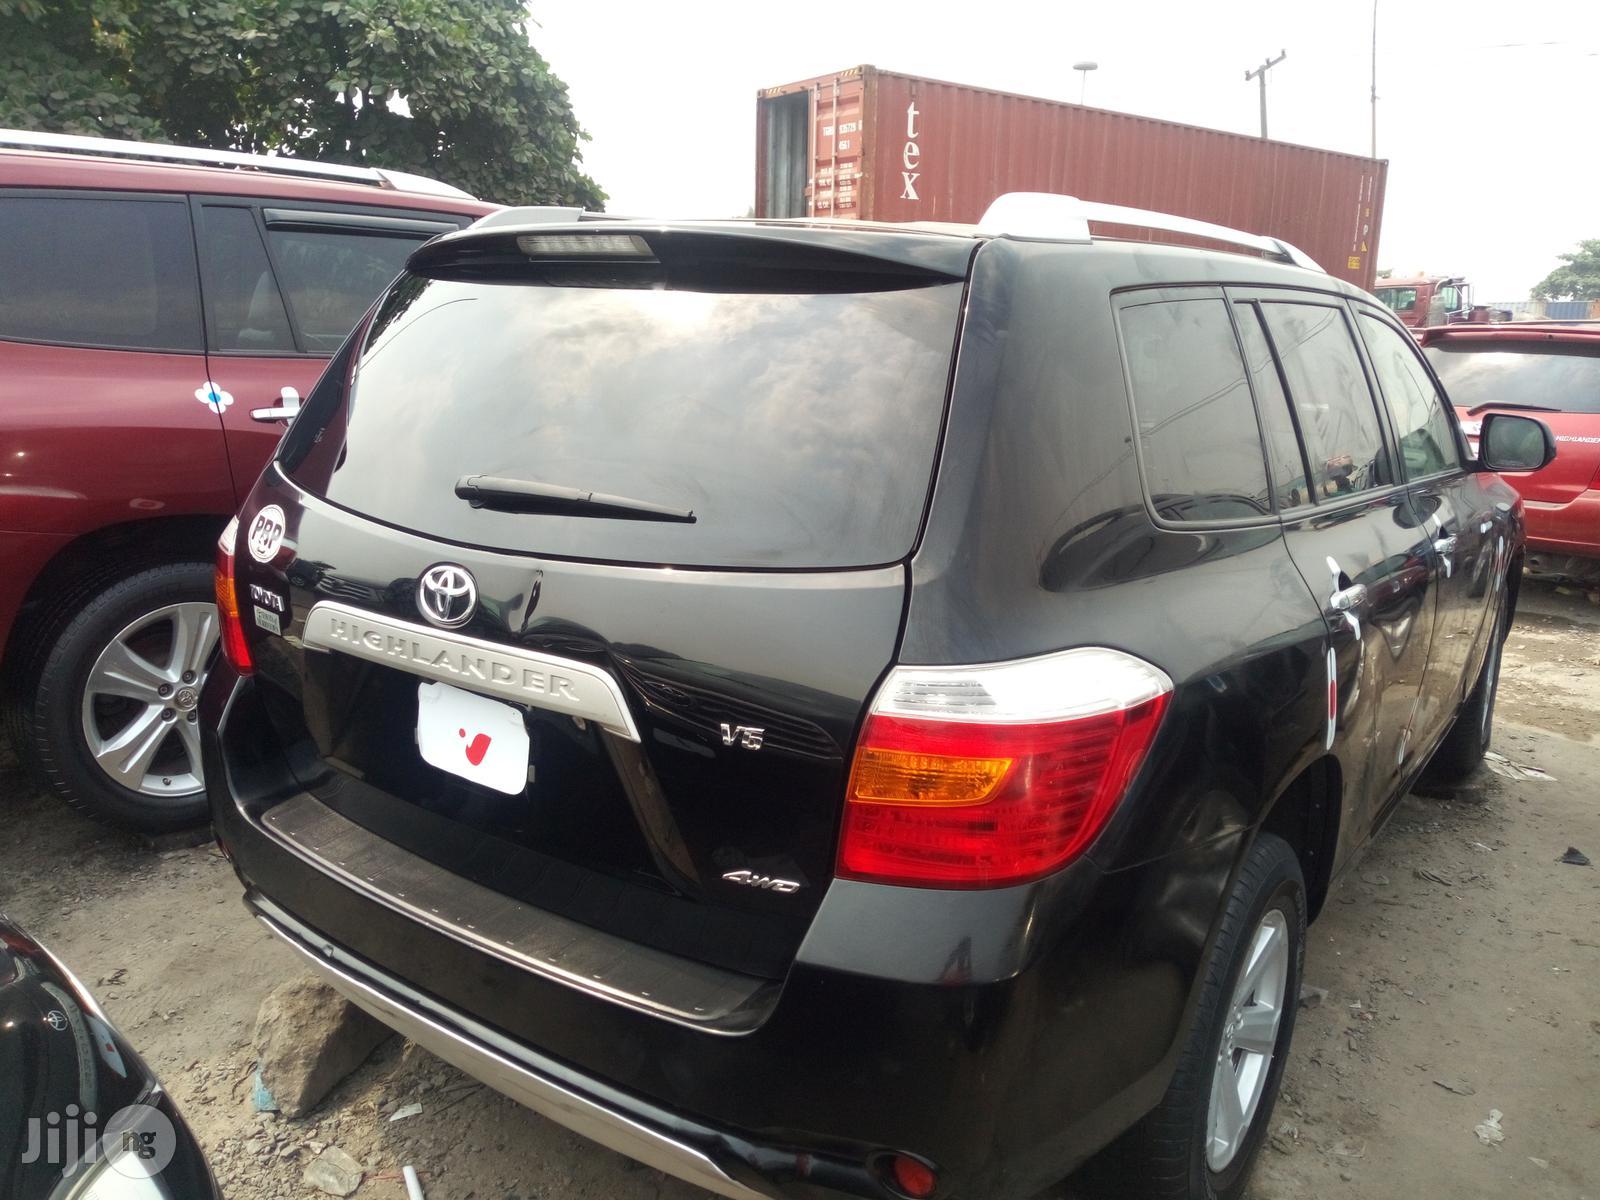 Toyota Highlander 2008 Black | Cars for sale in Apapa, Lagos State, Nigeria